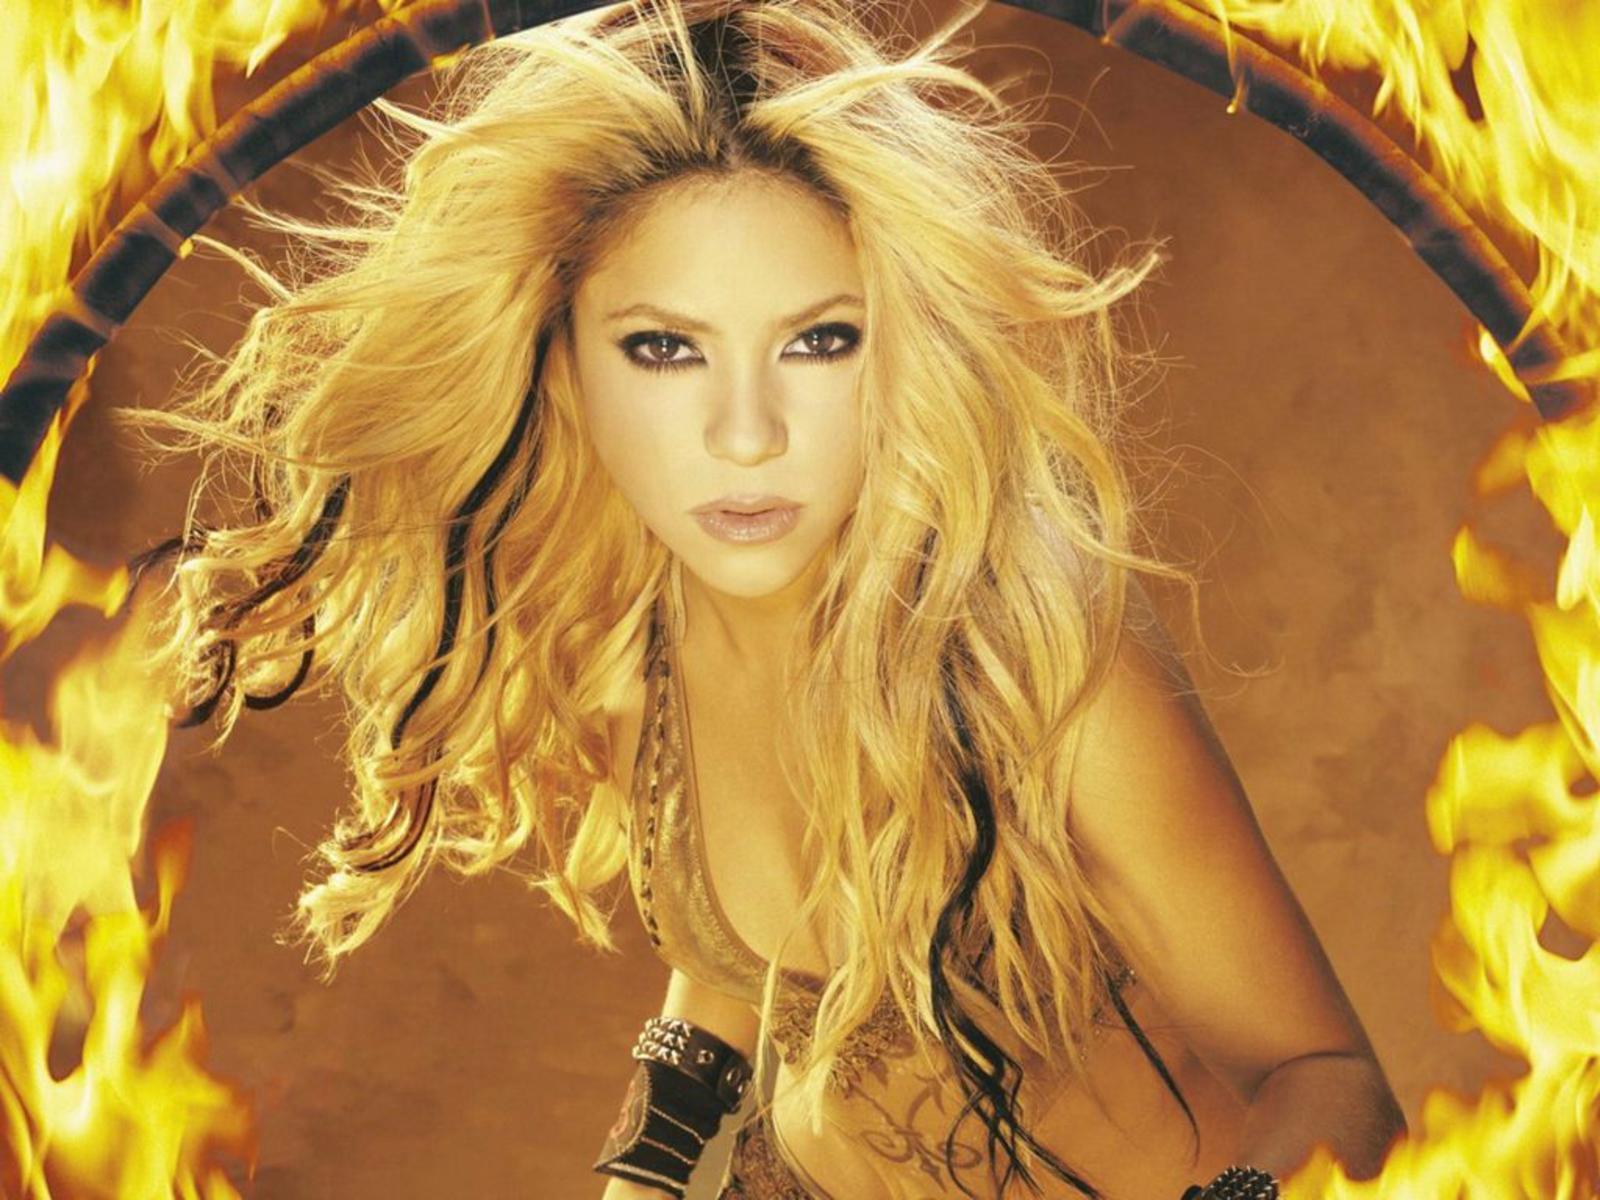 http://1.bp.blogspot.com/_D29sgNDNHRU/TSrjgKwoemI/AAAAAAAAAeg/Fmb4uc3FW8k/s1600/ws_Hot_Shakira_1600x1200wnfun.jpg